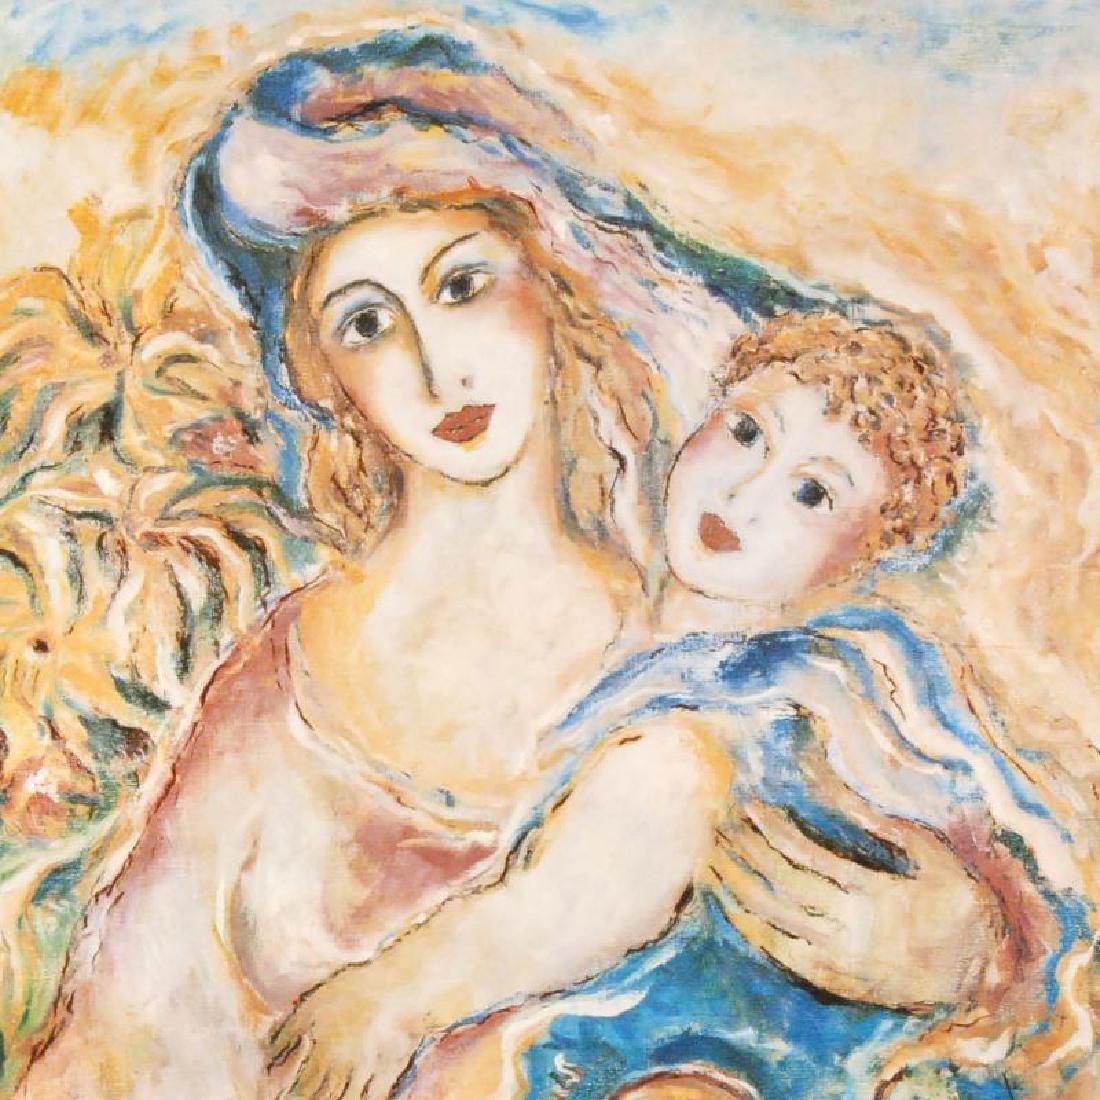 Mother's Love by Steynovitz (1951-2000) - 2